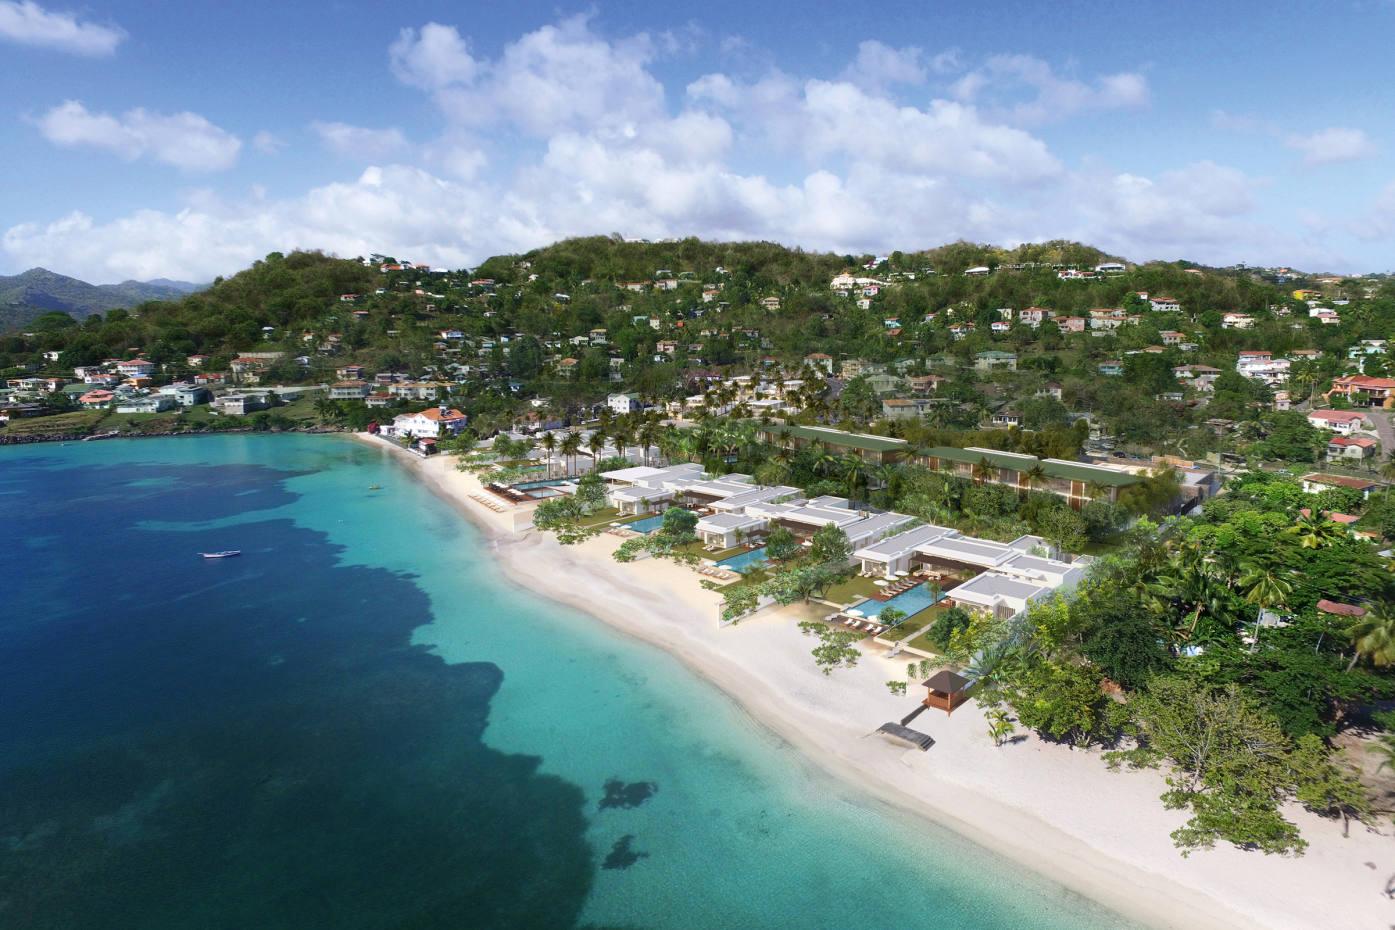 Silversands sits on Grenada's stunning Grand Anse beach